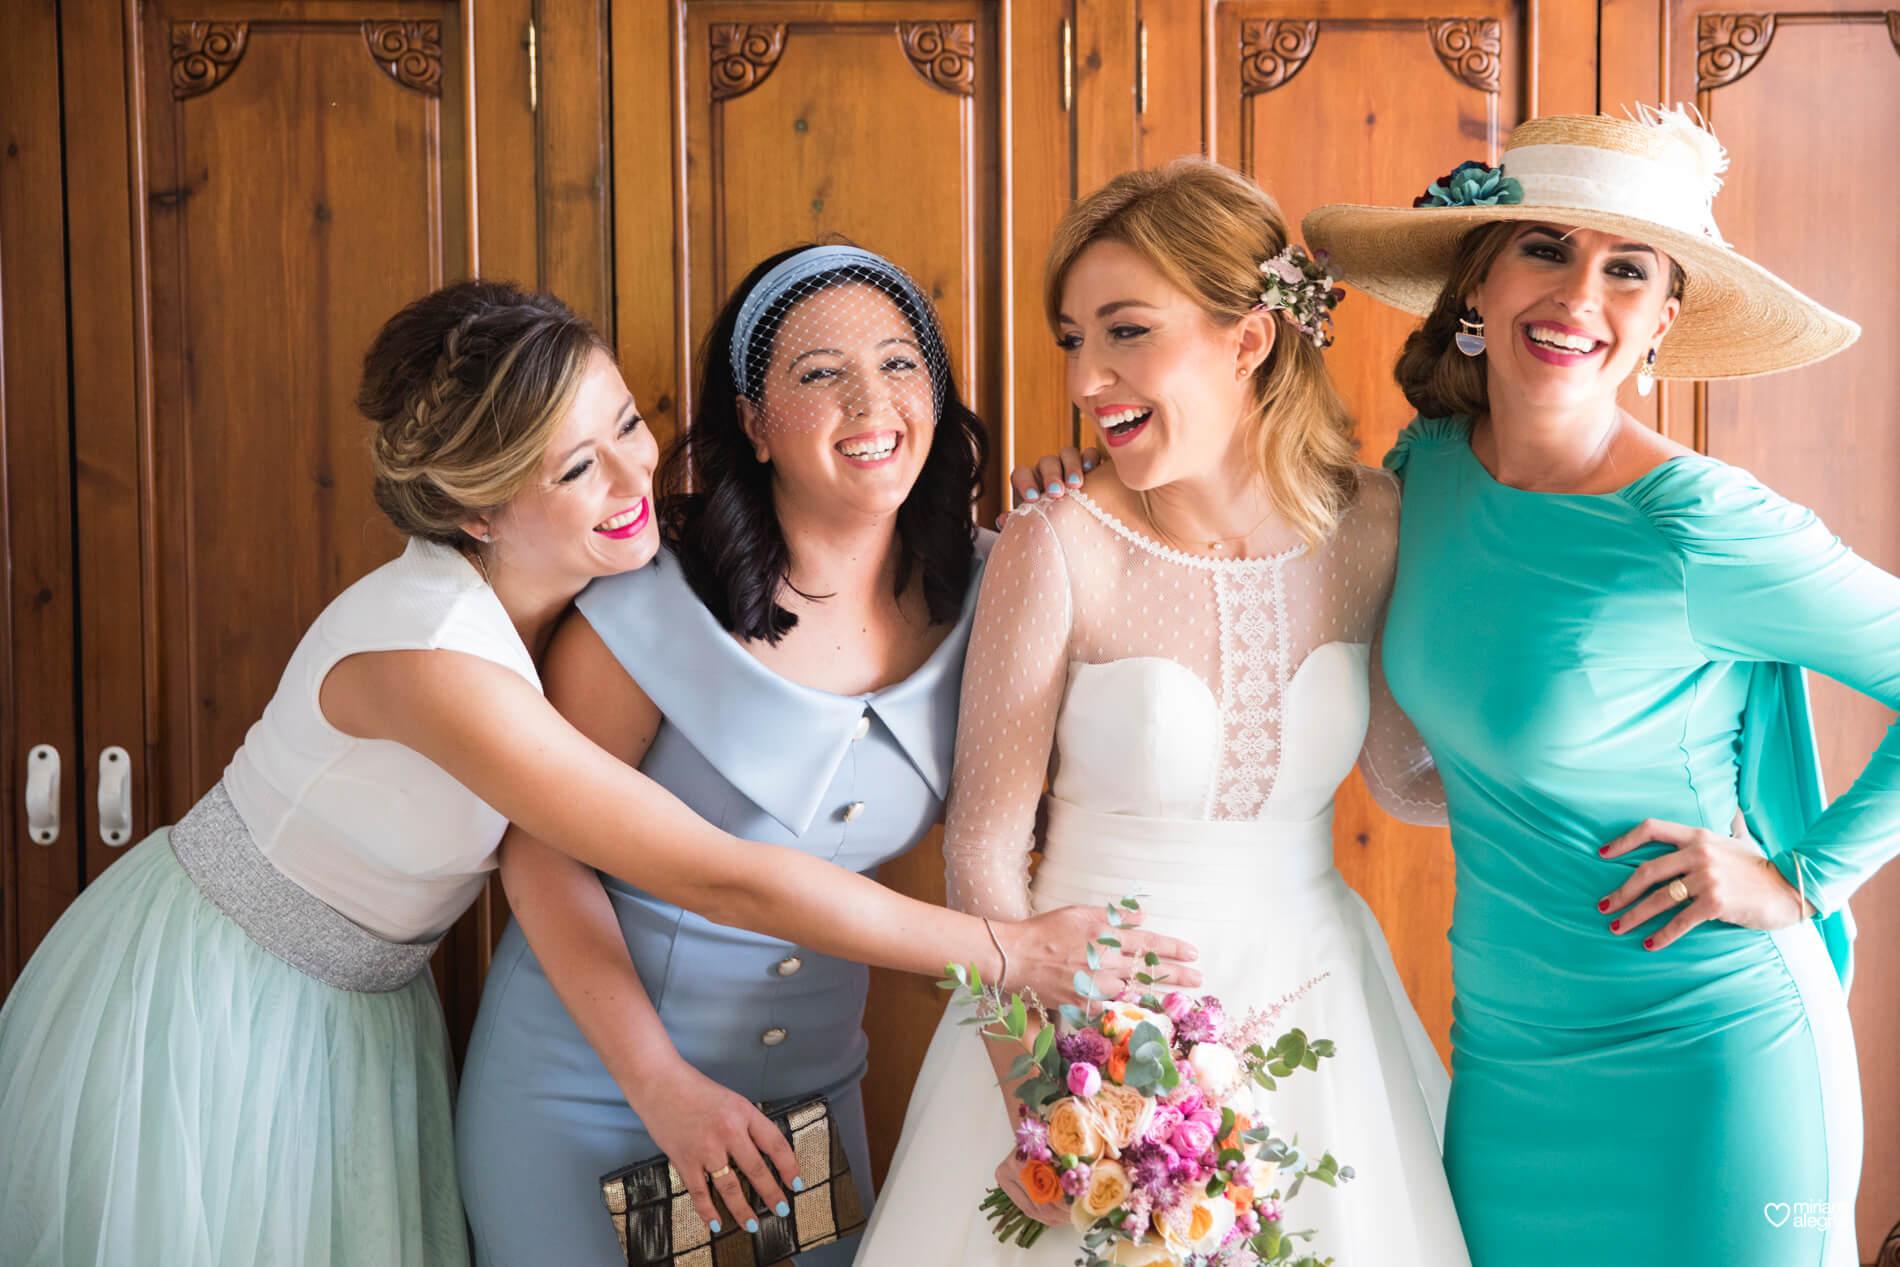 la-boda-de-alemc7-miriam-alegria-fotografos-boda-murcia-35